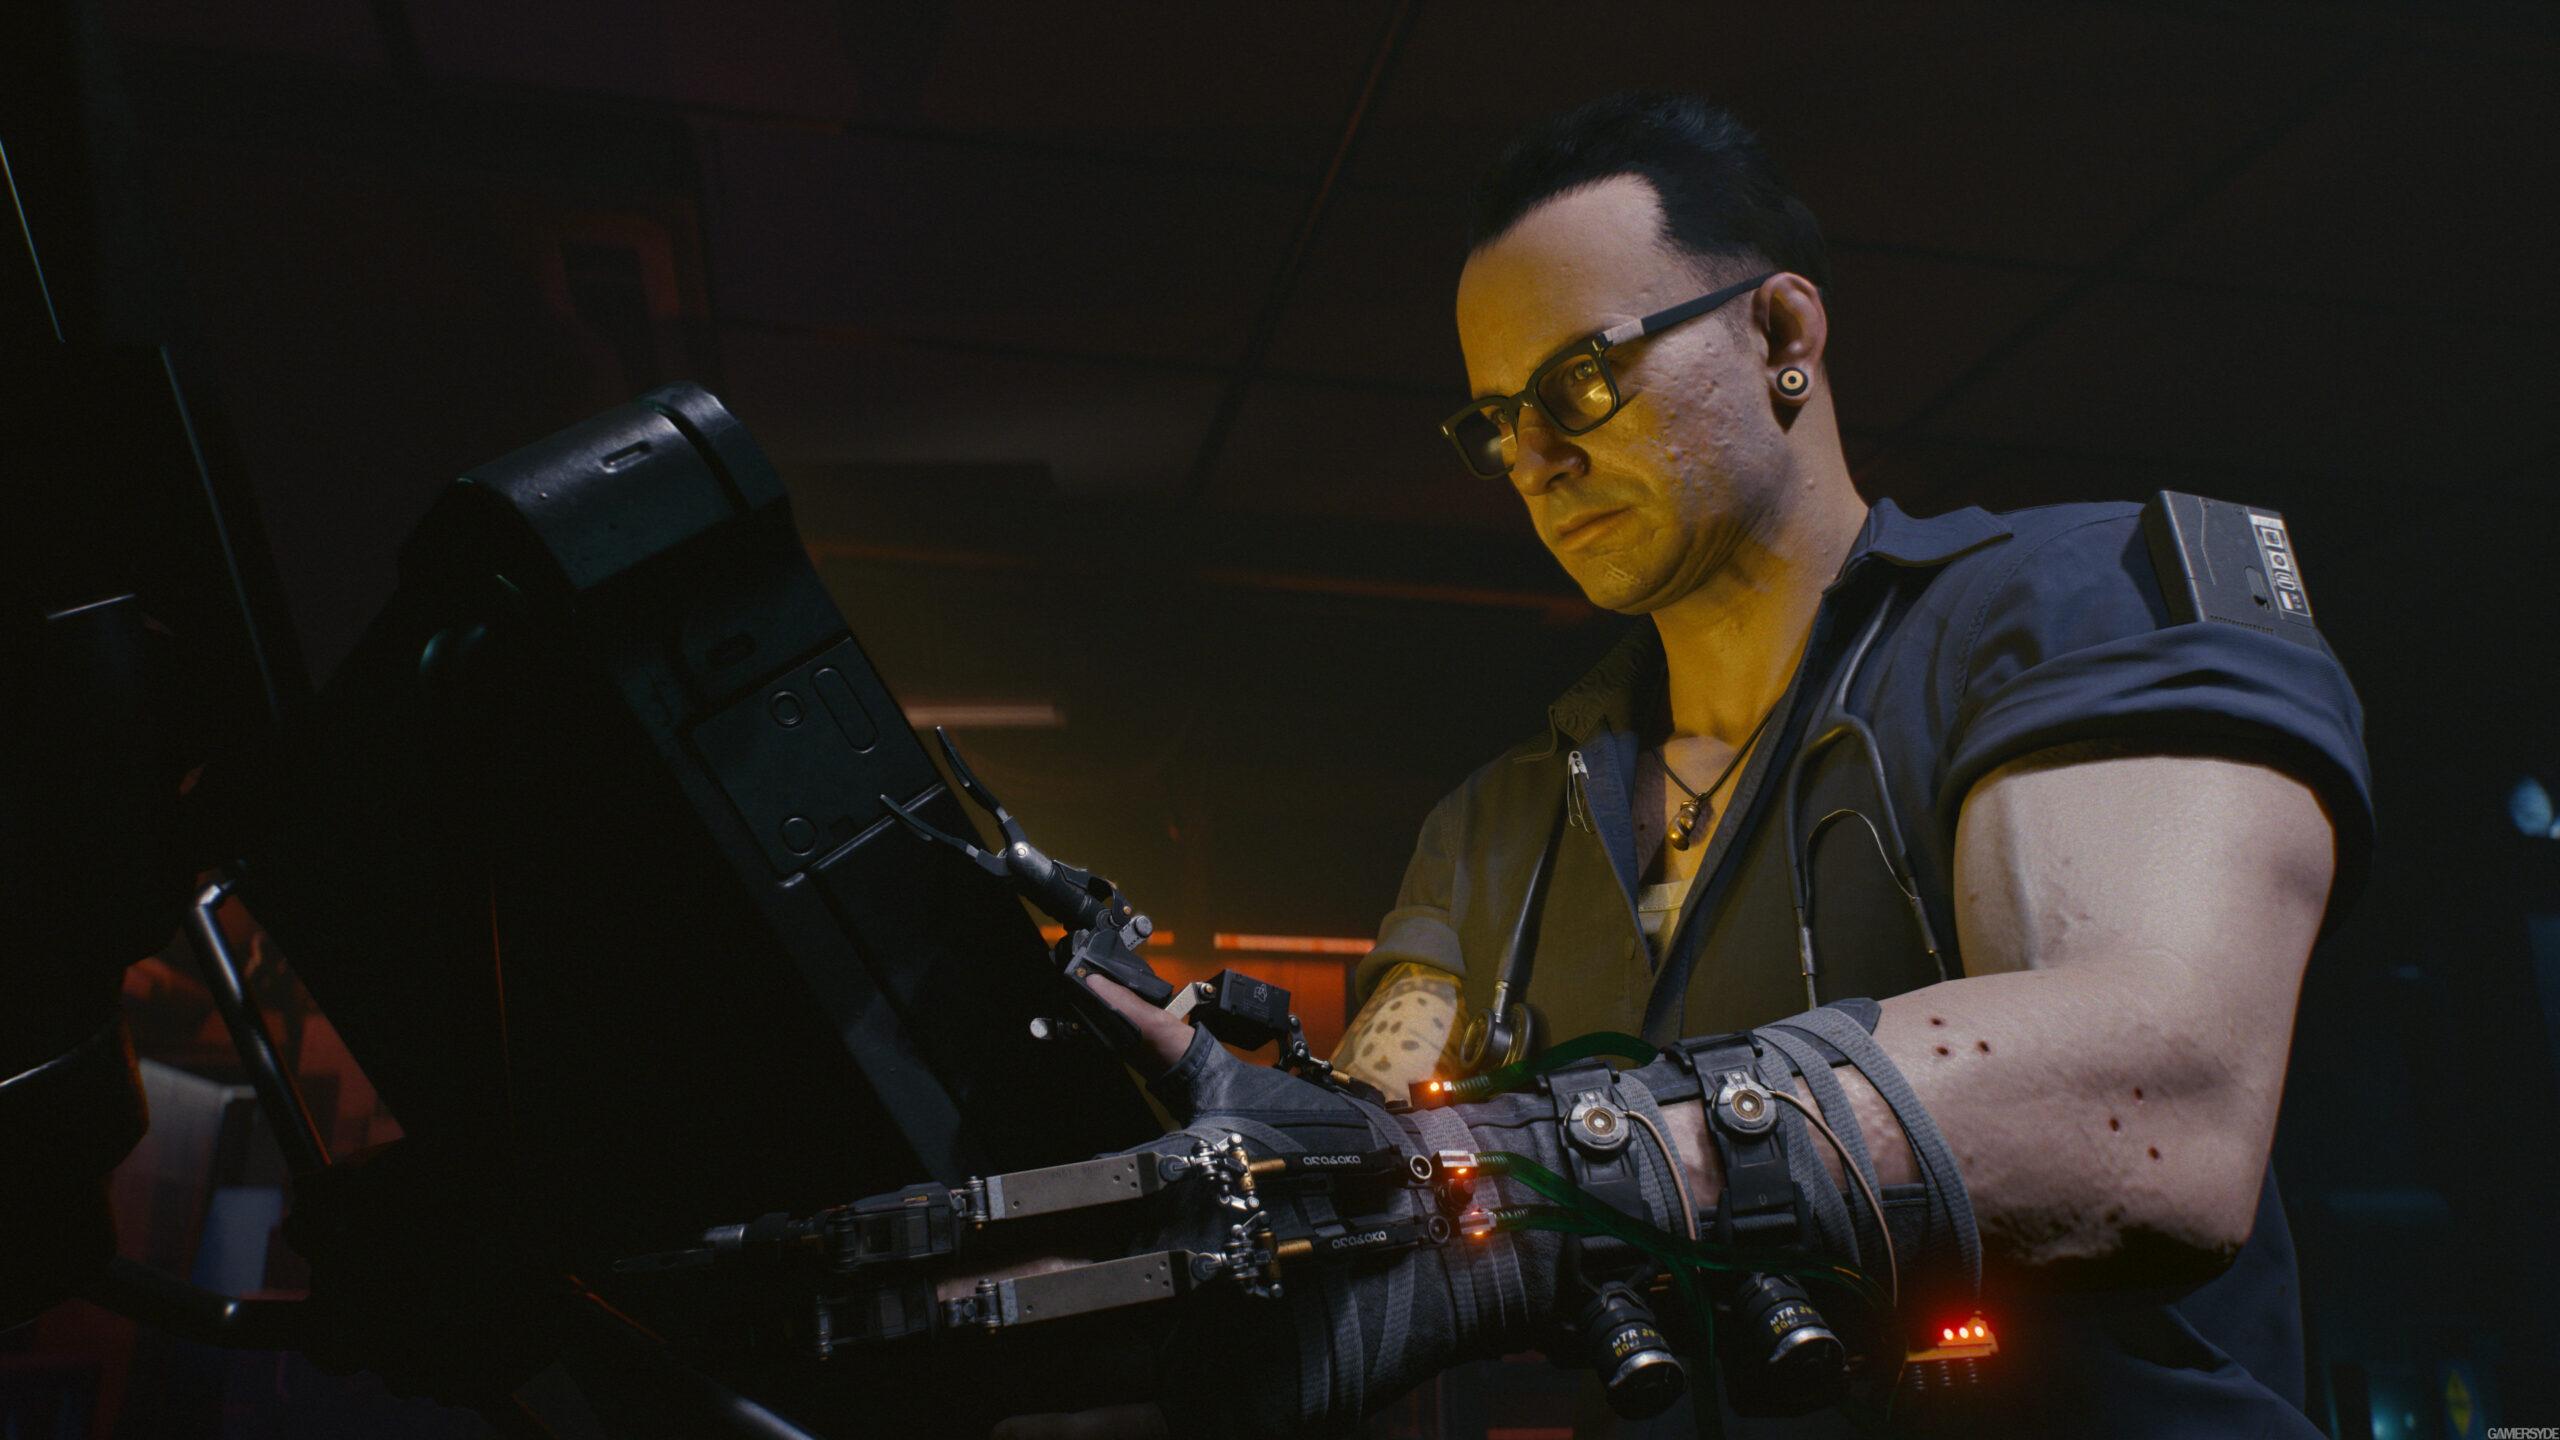 Cyberpunk 2077 cdpr apology